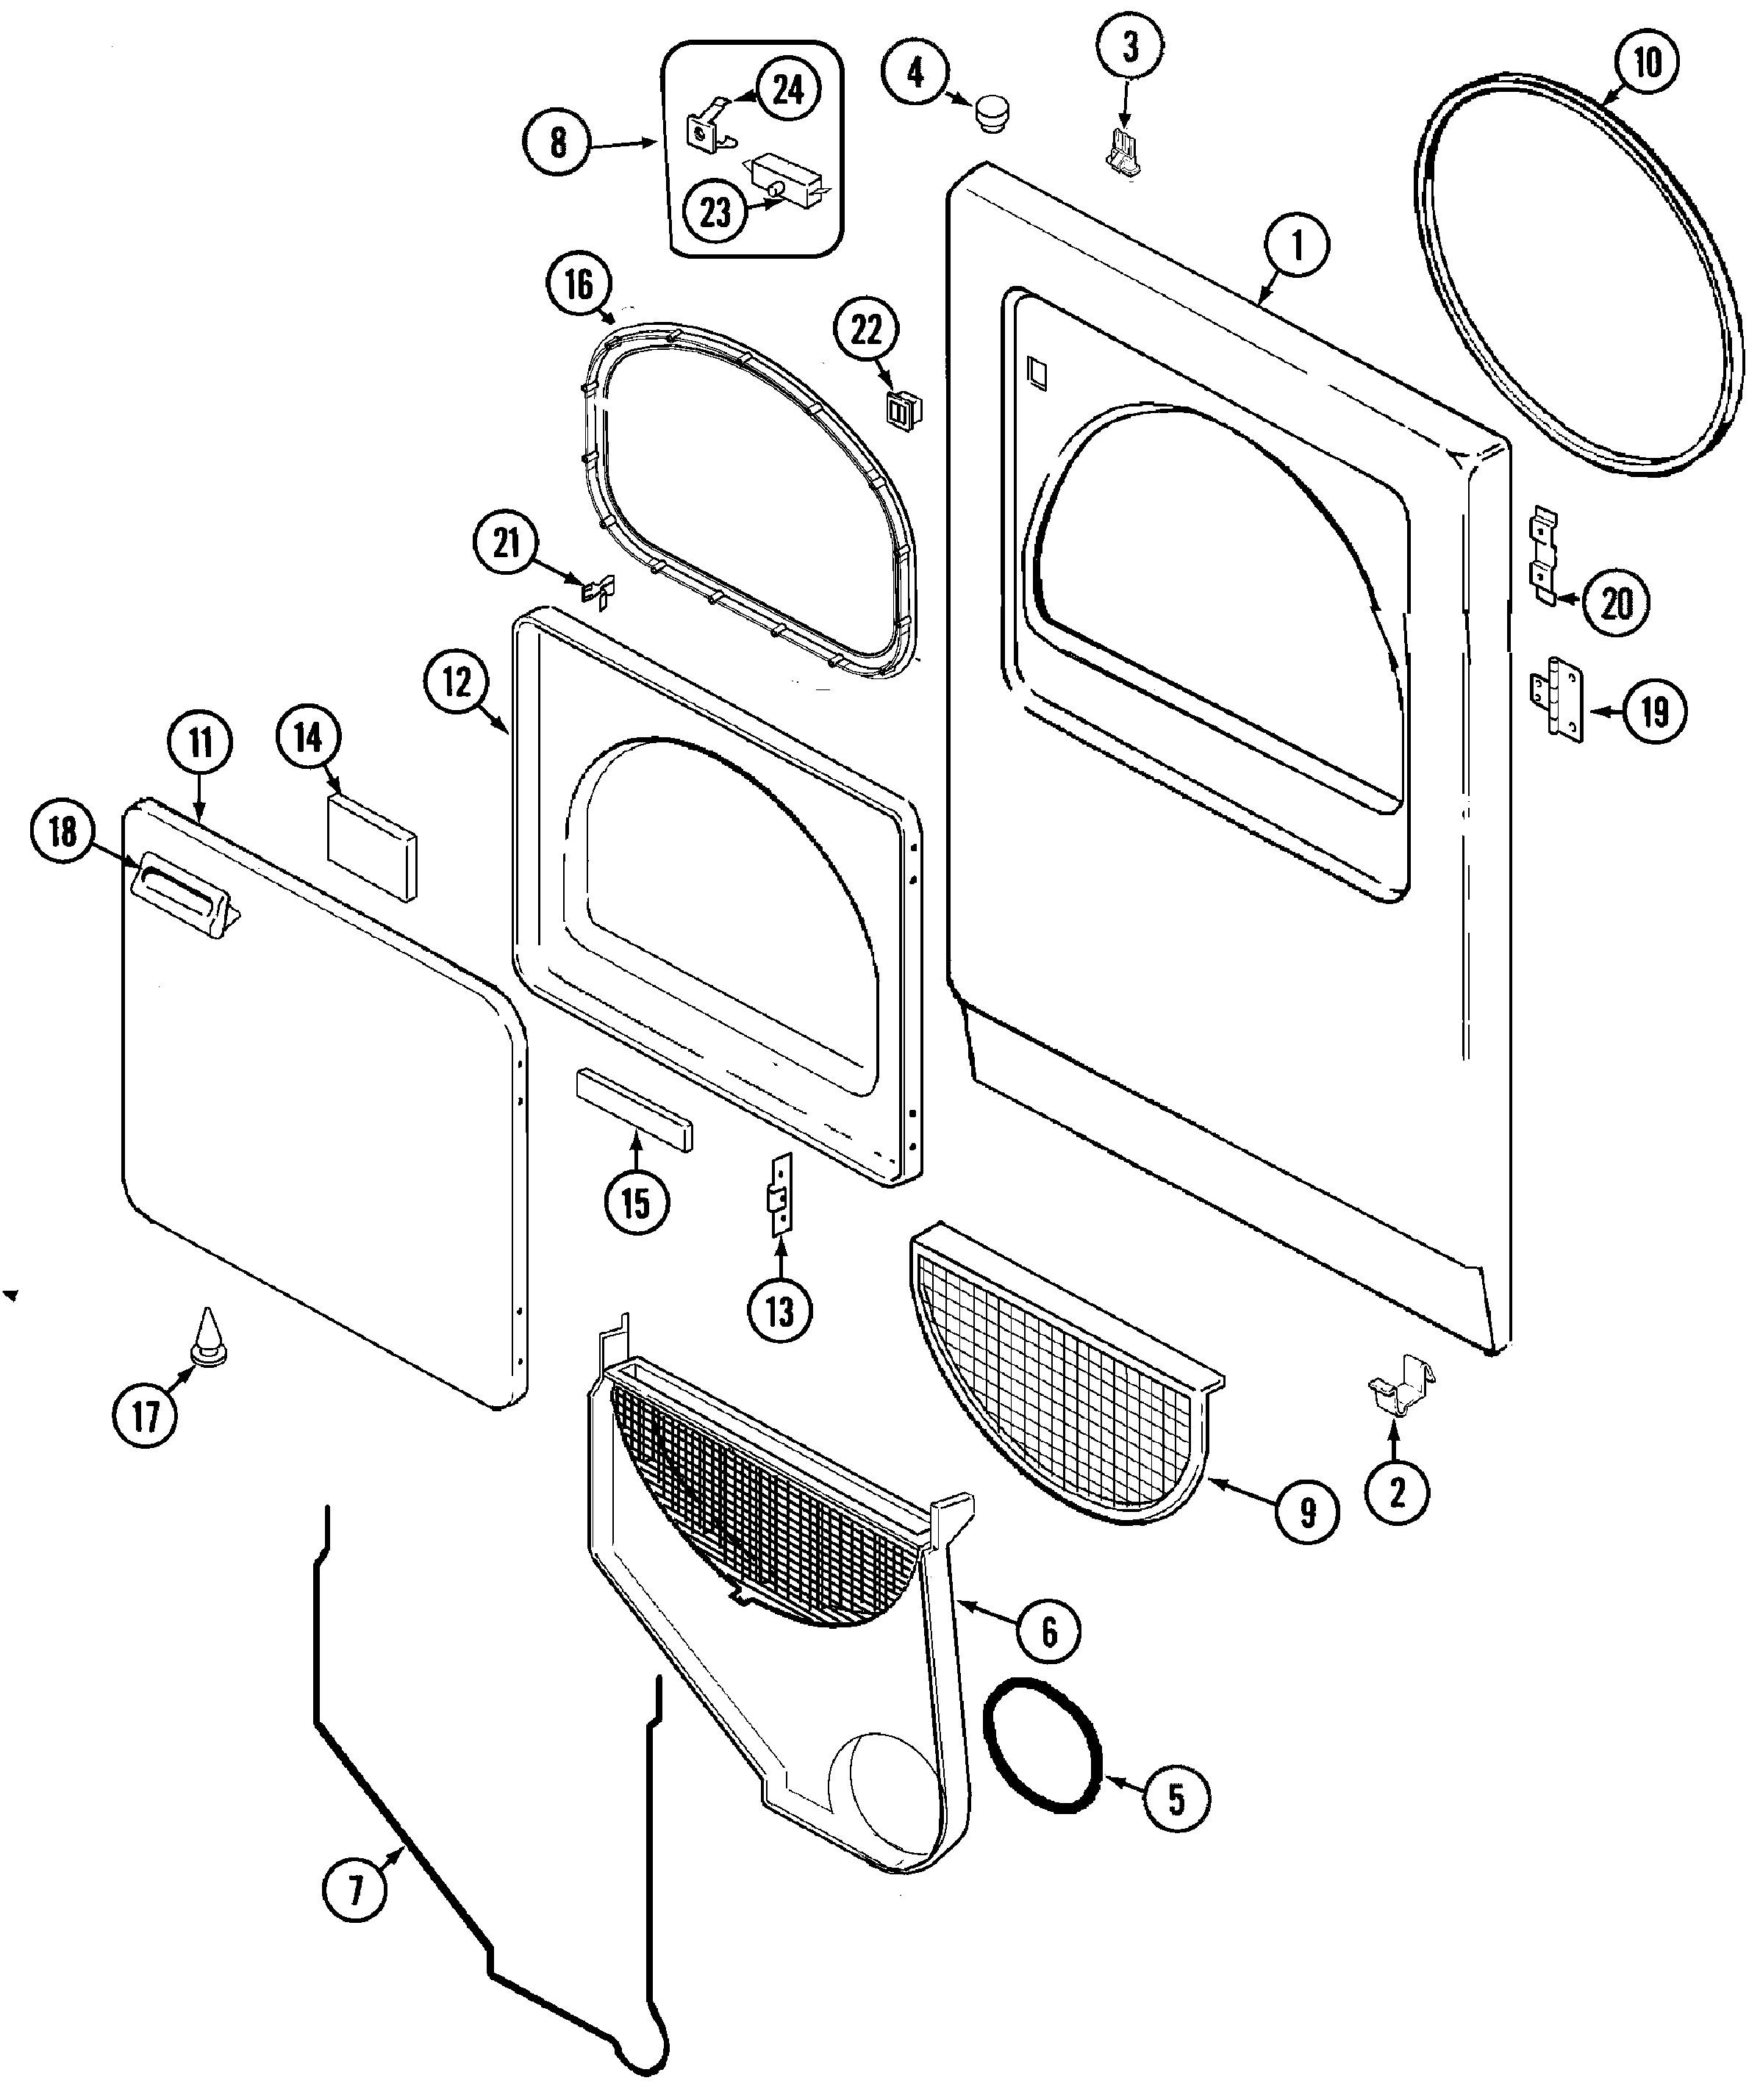 Admiral Dishwasher Wiring Diagrams - 6 Round Trailer Wiring Diagram Ford -  ace-wiring.tukune.jeanjaures37.fr | Admiral Dishwasher Wiring Diagrams |  | Wiring Diagram Resource